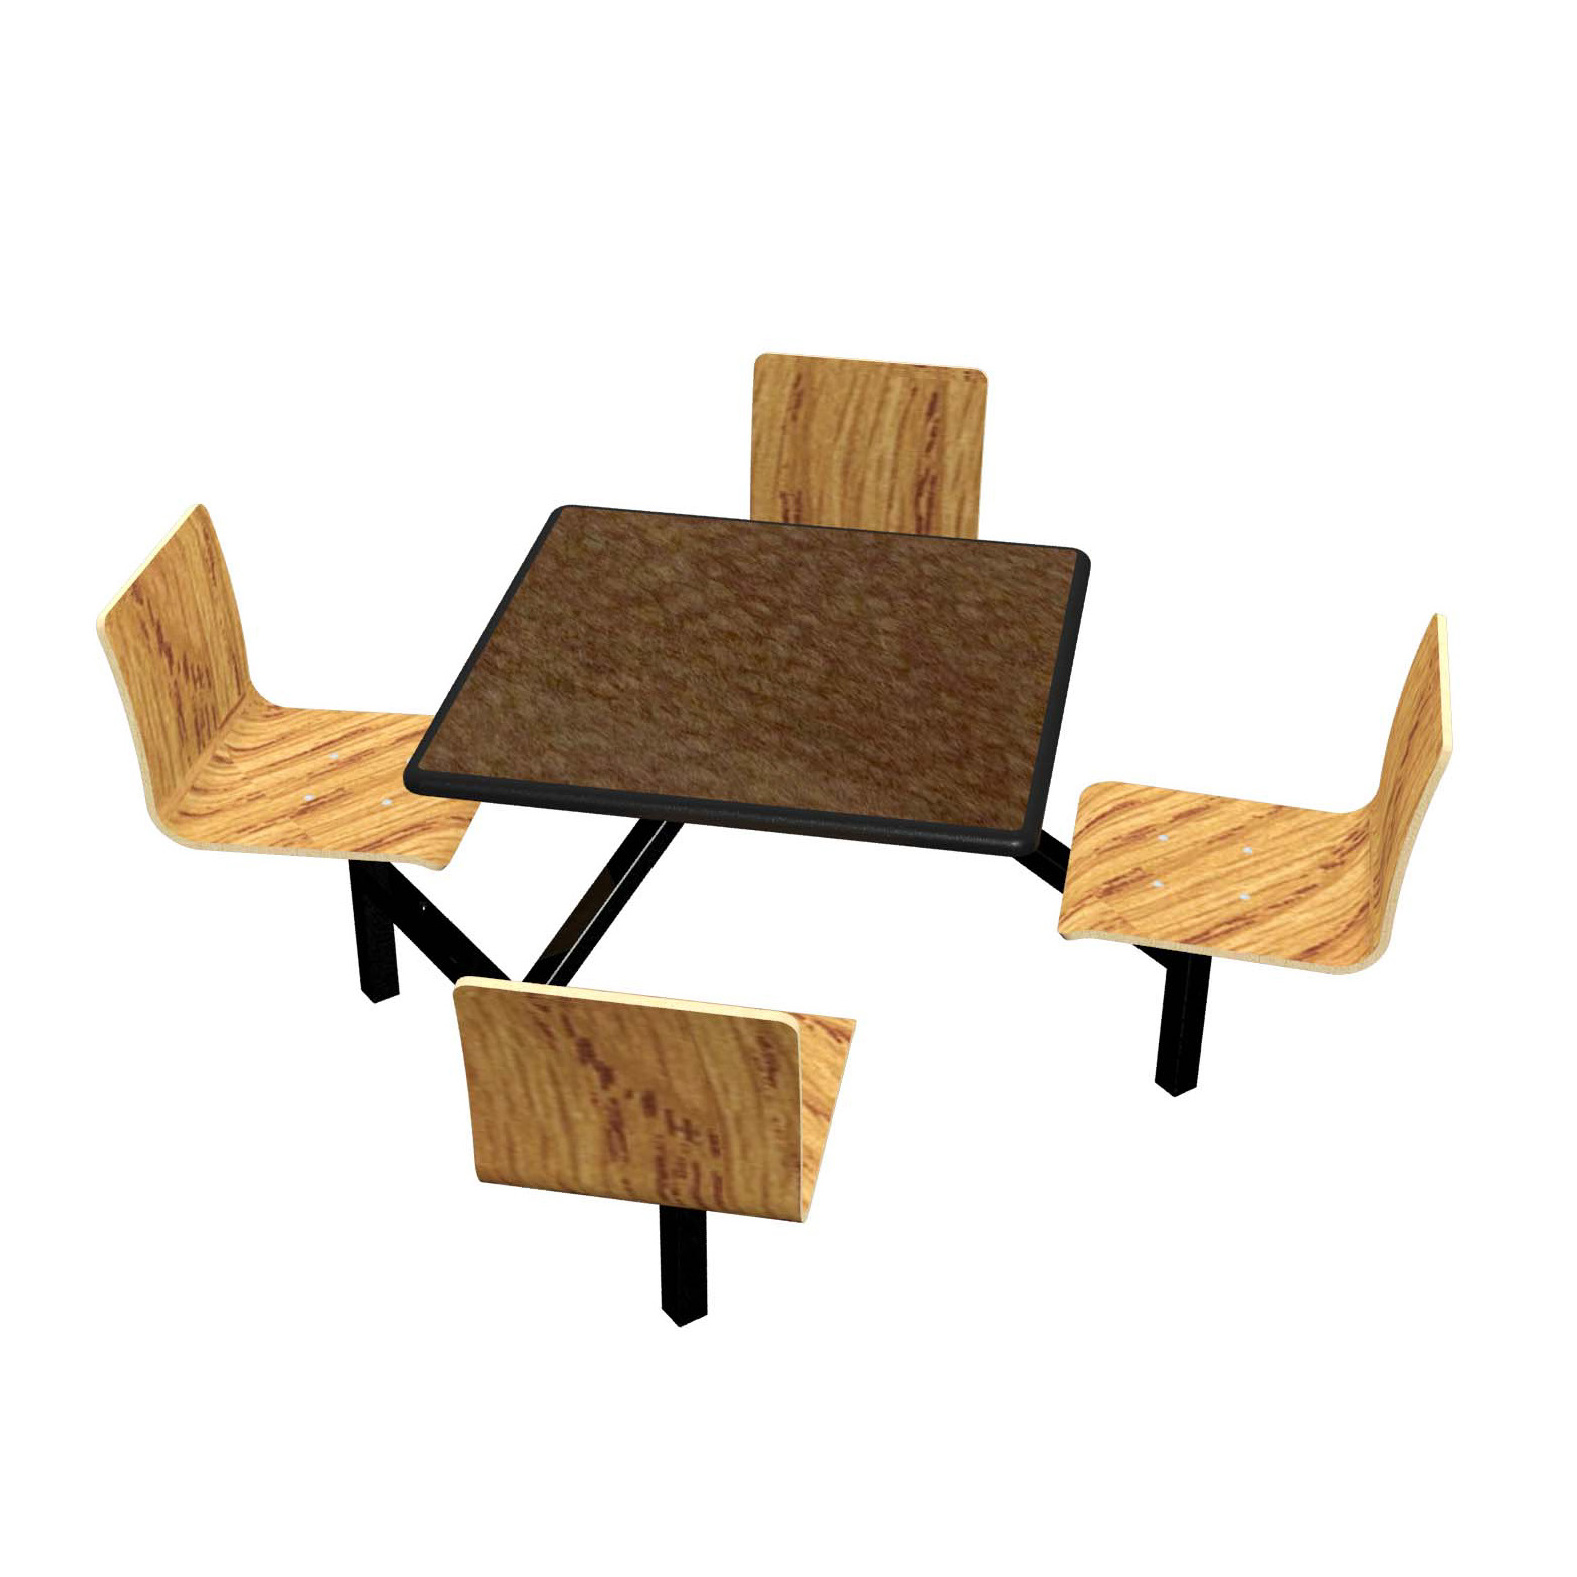 Plymold JUSQ004DELE cluster seating unit, indoor